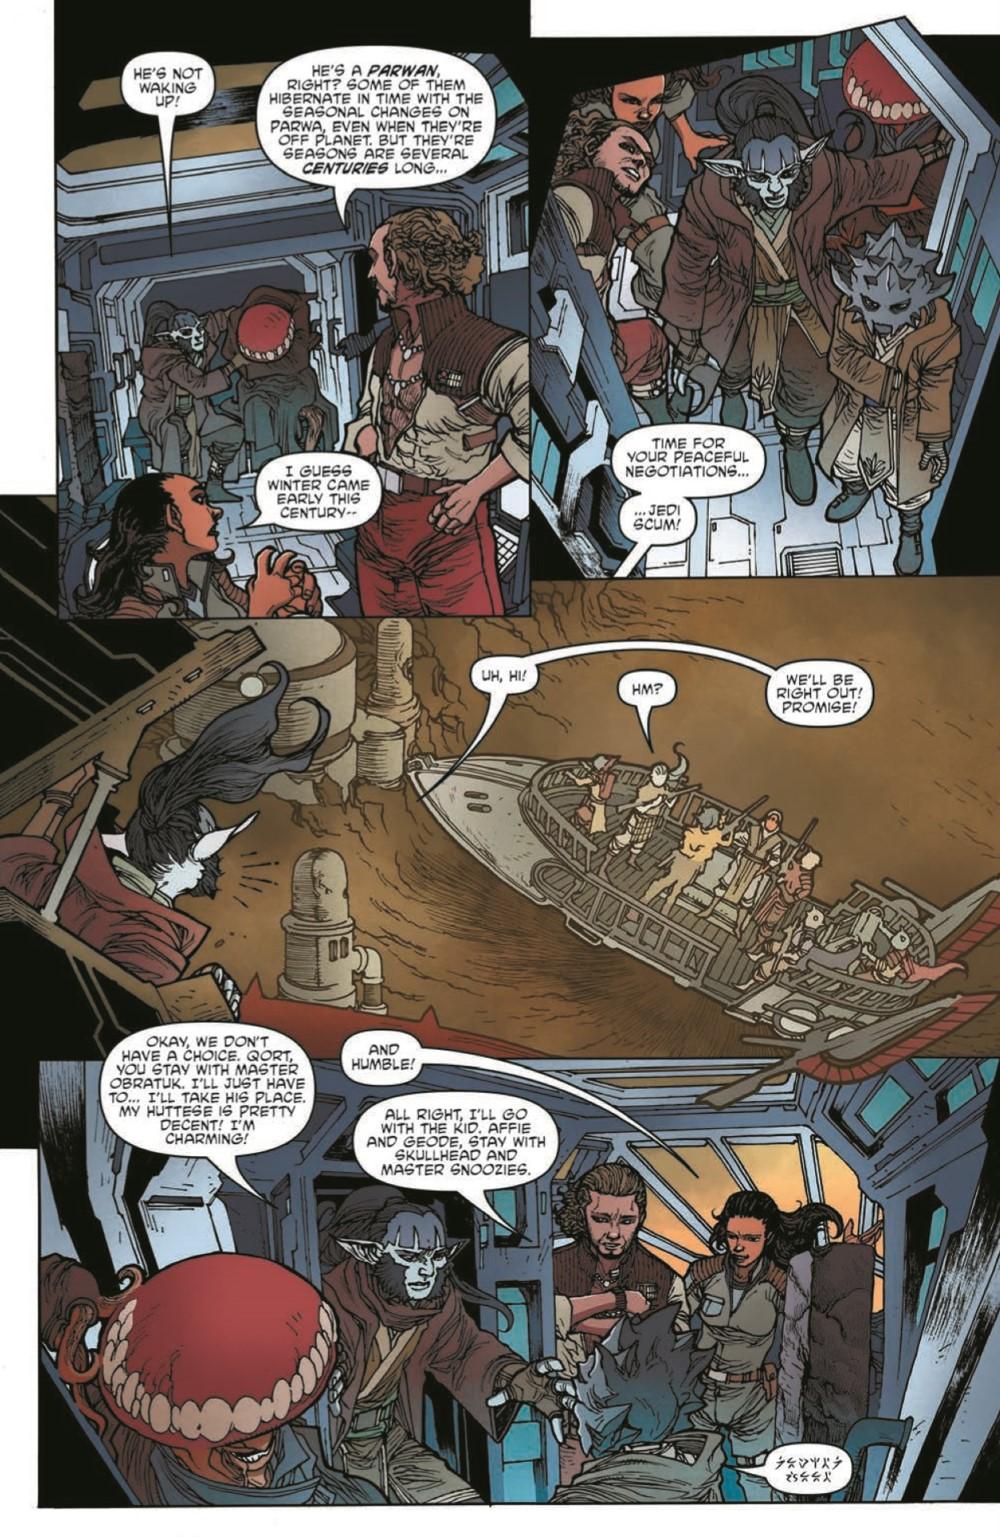 SWAHRA06-pr-7 ComicList Previews: STAR WARS THE HIGH REPUBLIC ADVENTURES #6